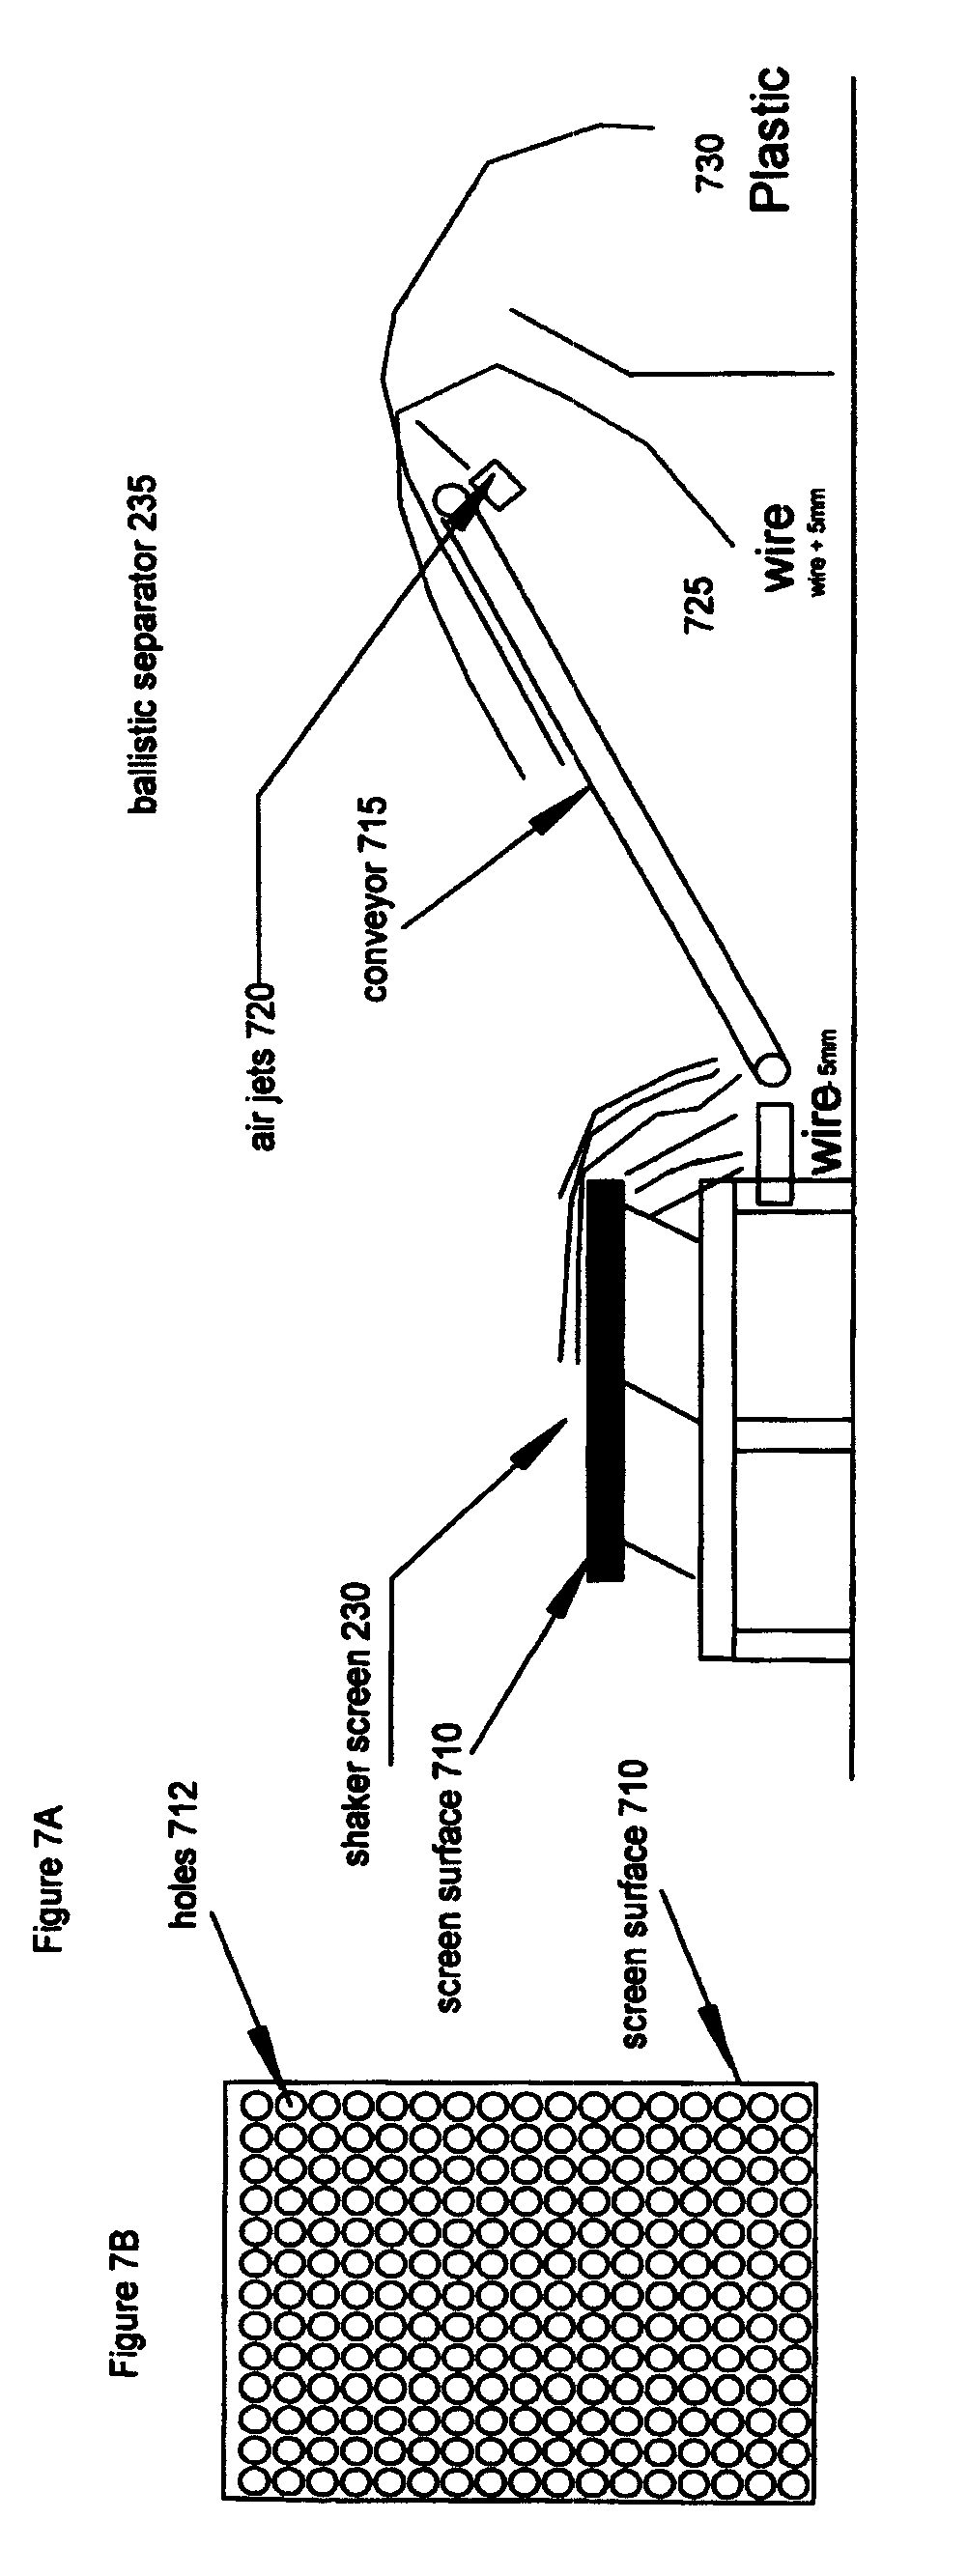 Patent Us8201692 Materials Separation Module Google